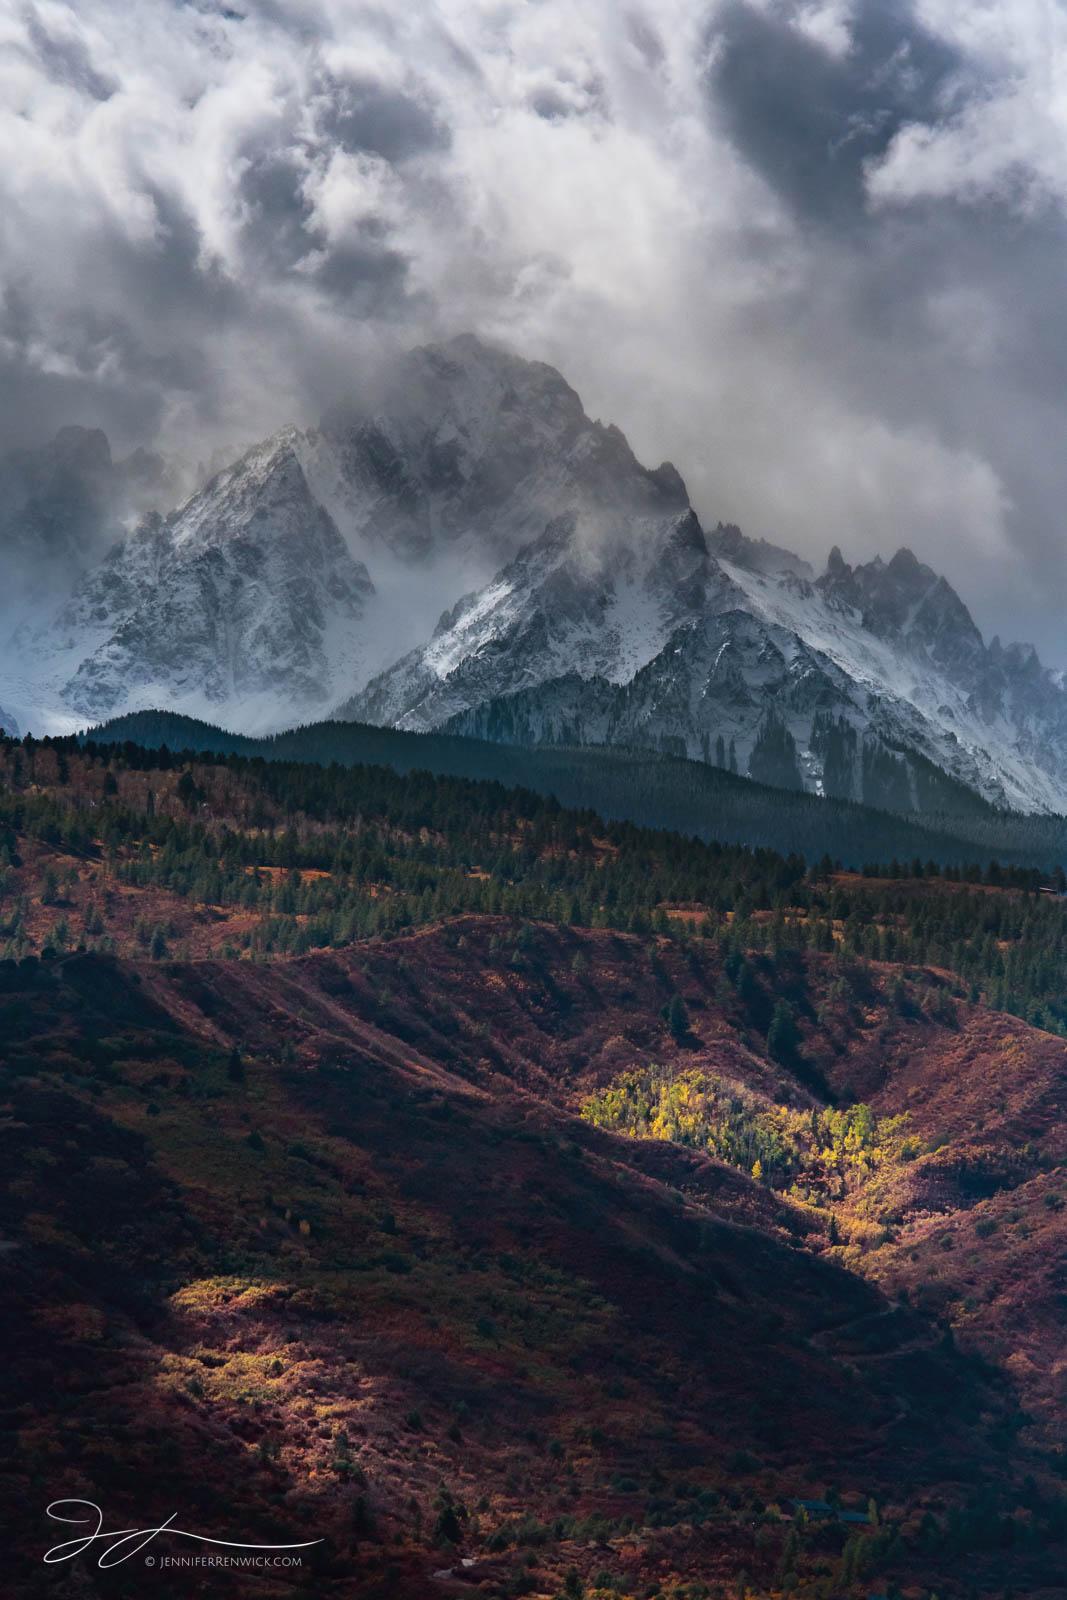 Mt. Sneffels overlooks an autumn valley near Ridgway, Colorado.